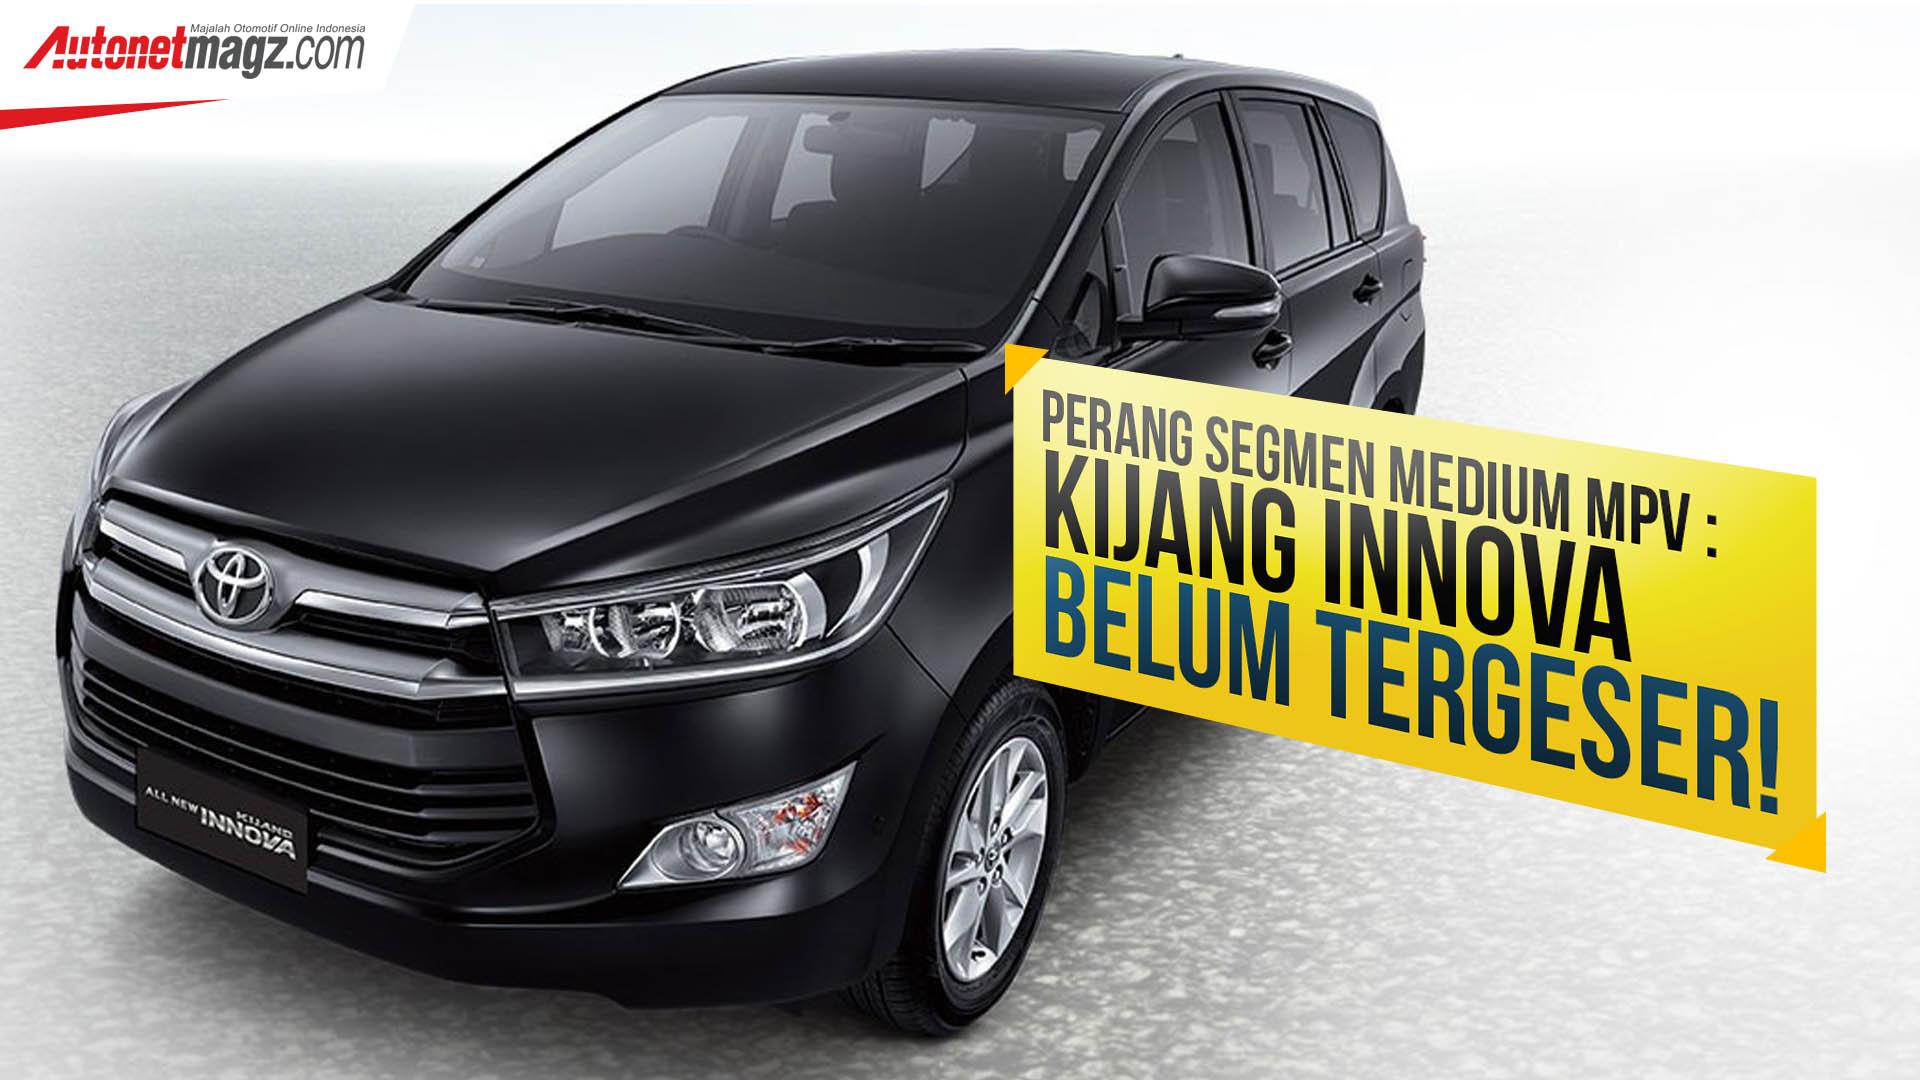 all new kijang innova v diesel harga camry 2018 indonesia perang segmen medium mpv belum tergeser